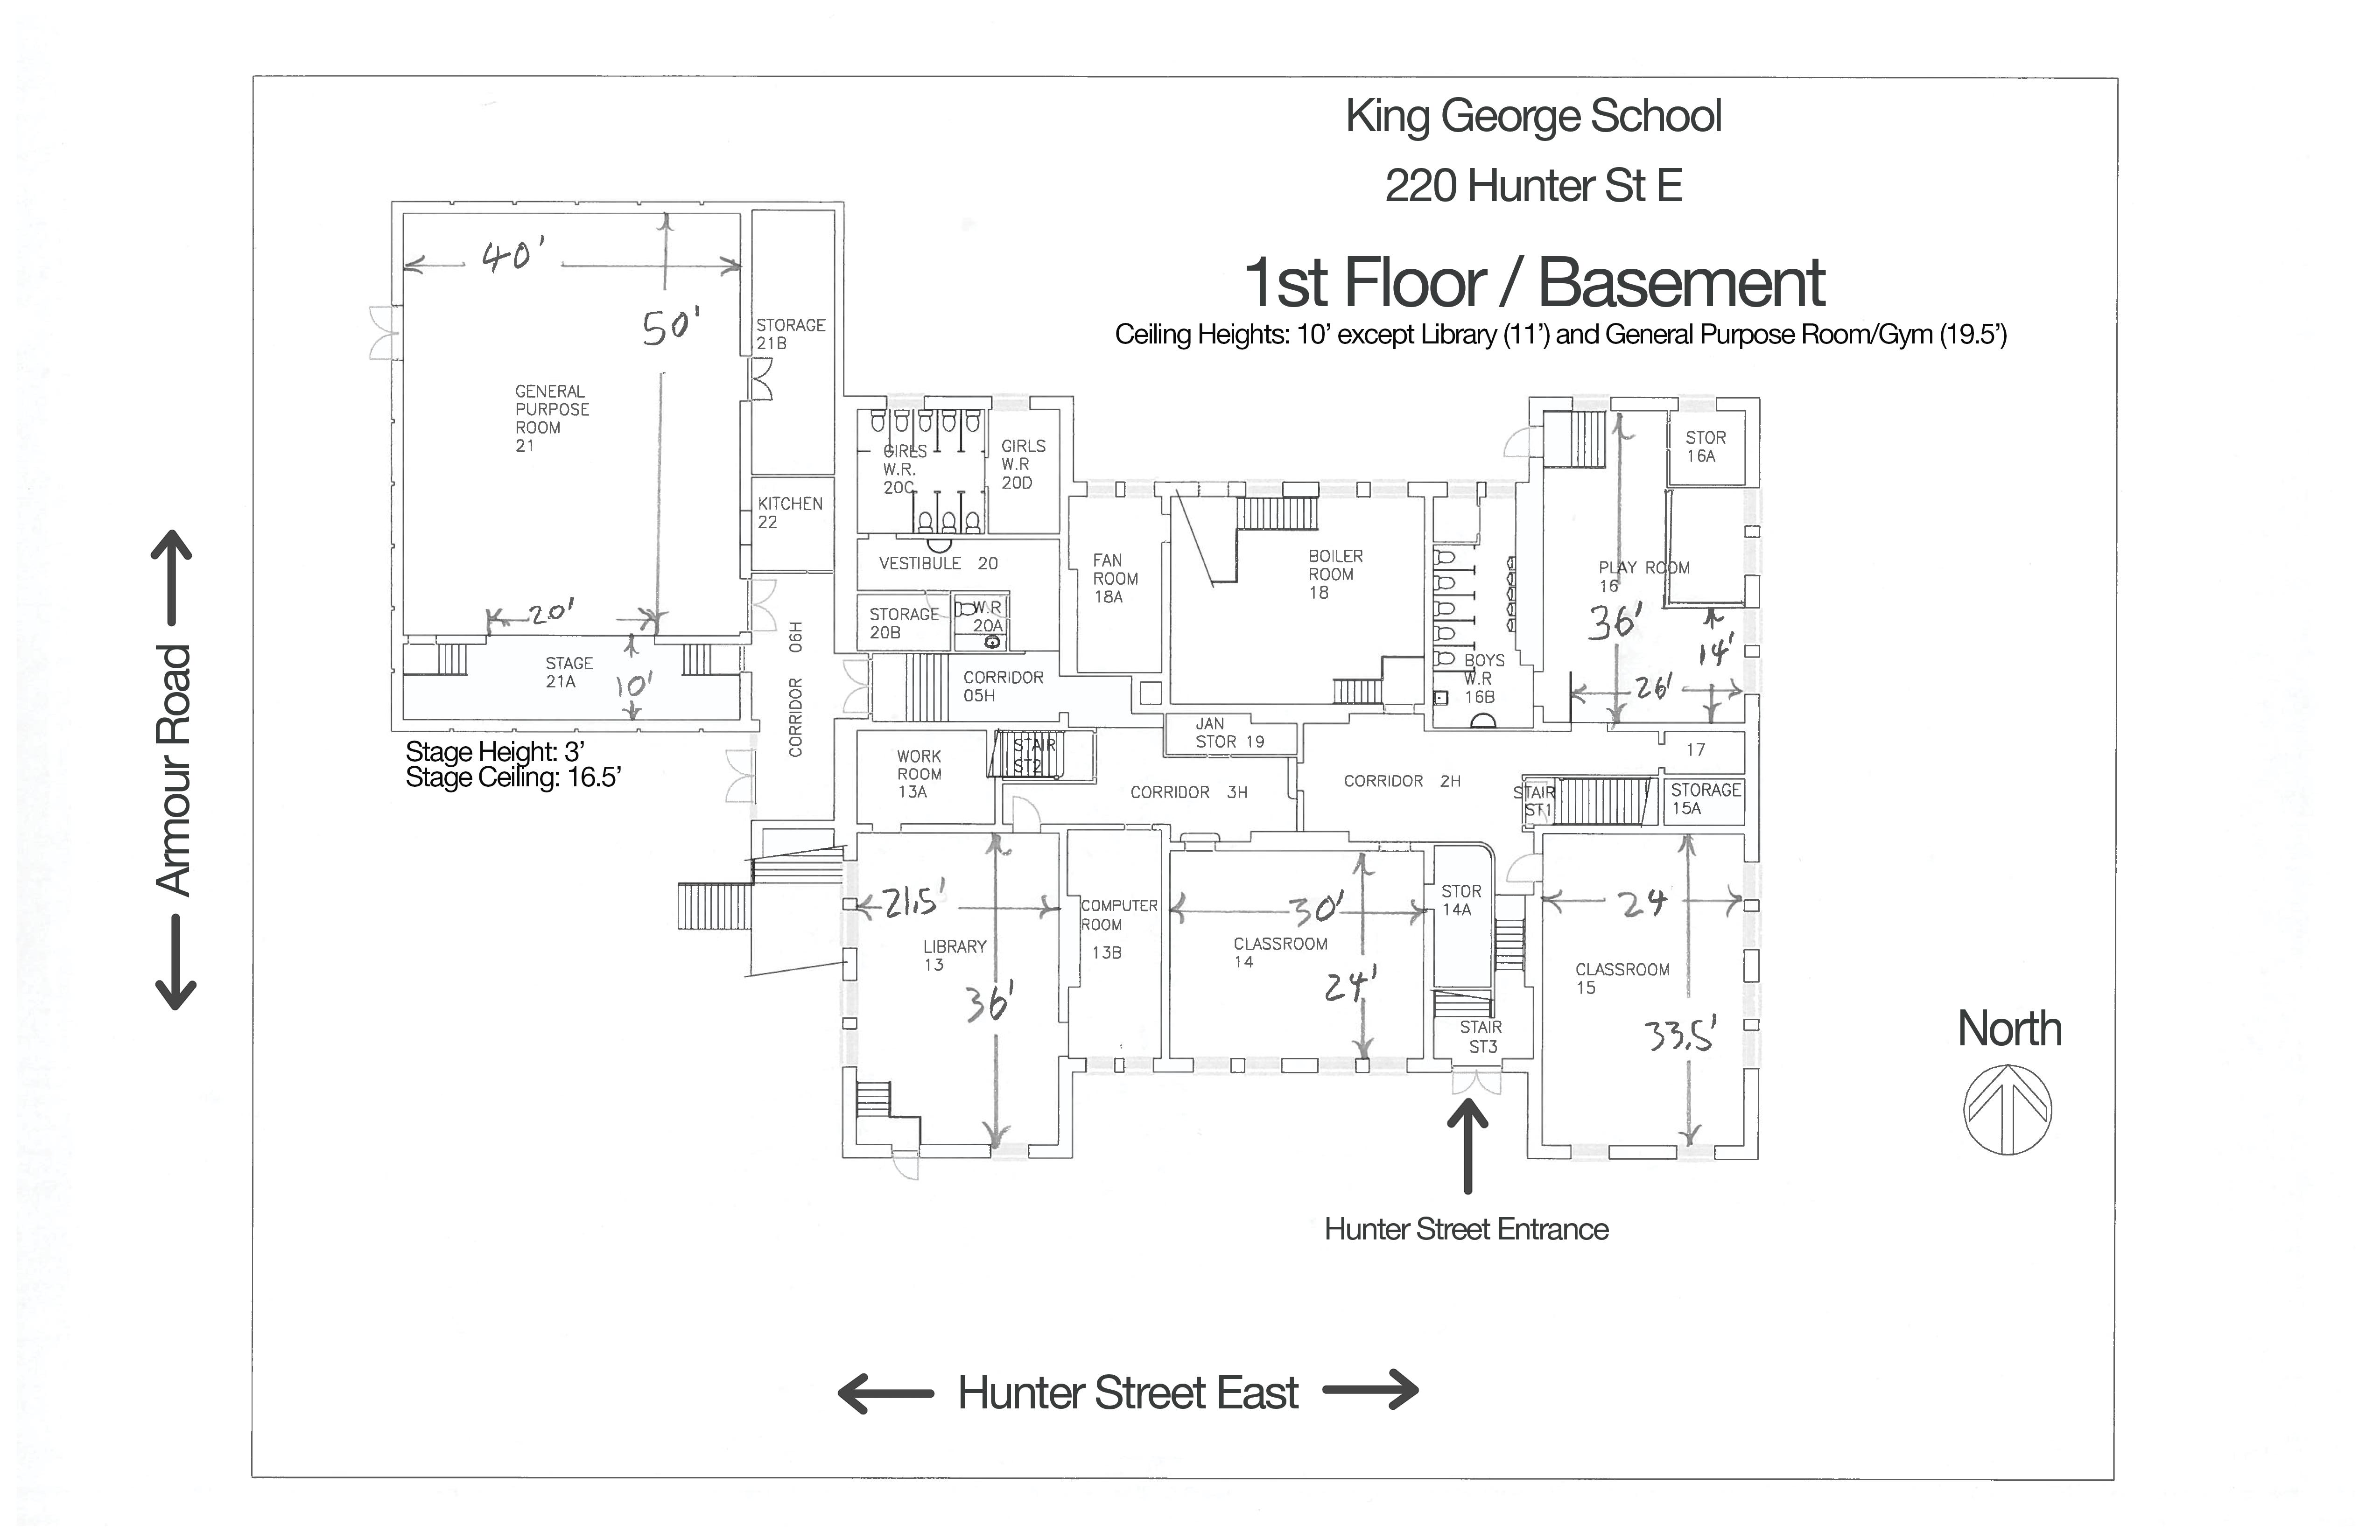 King George First Floor Basement Floorplan